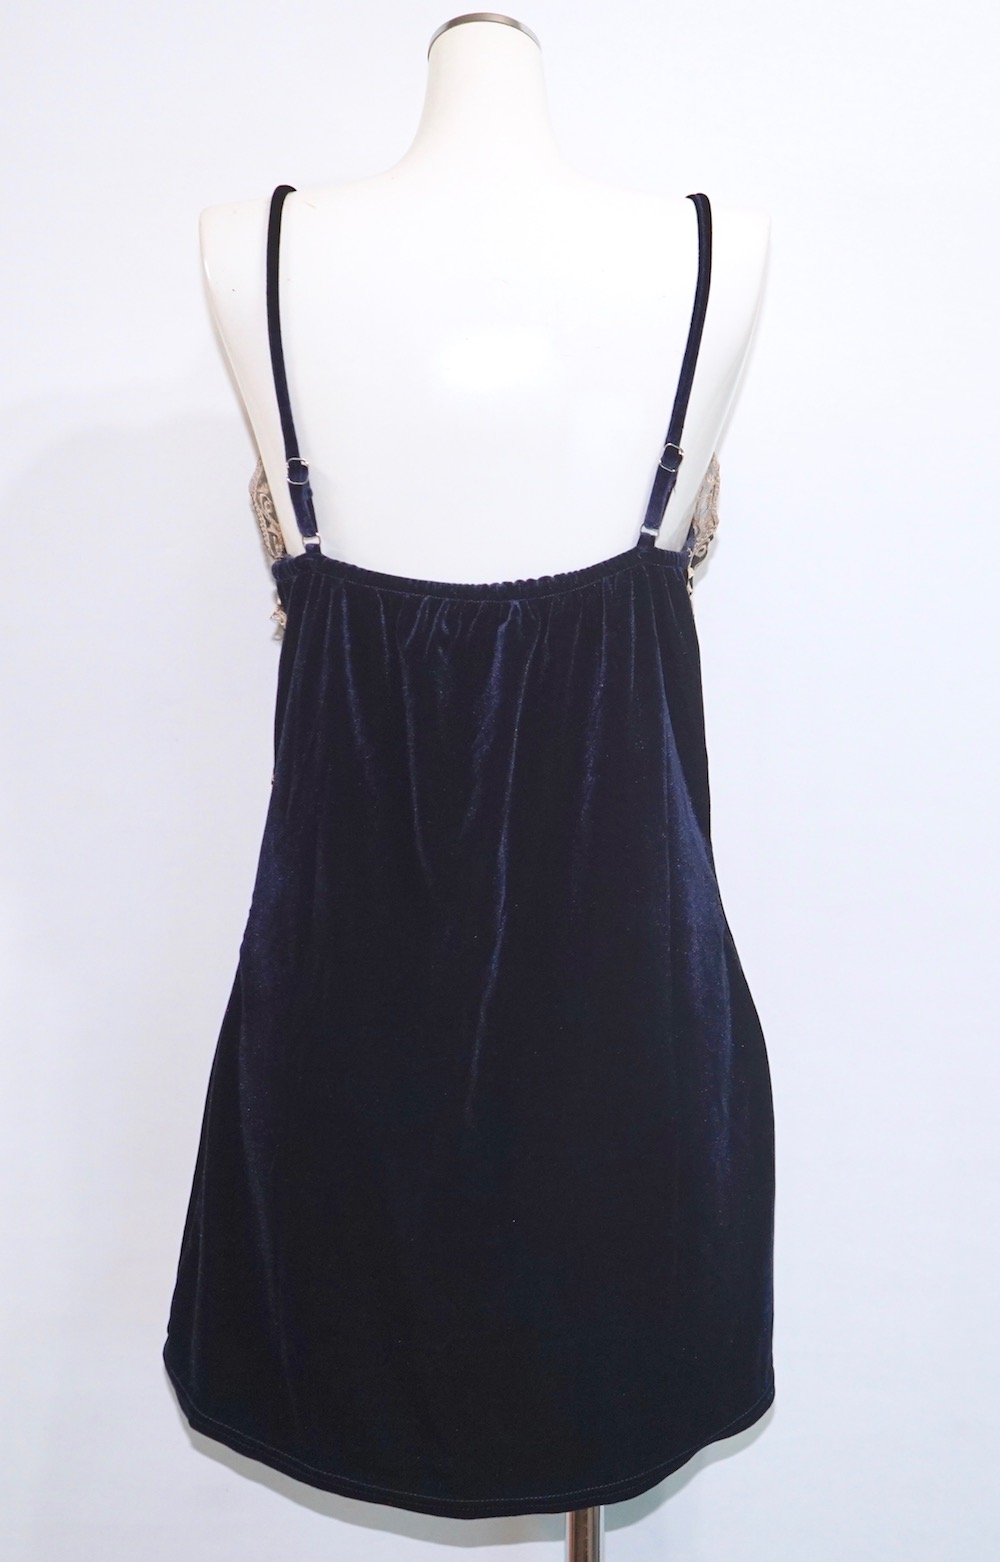 Velvet Lace Trim Camisole Onepiece (navy)